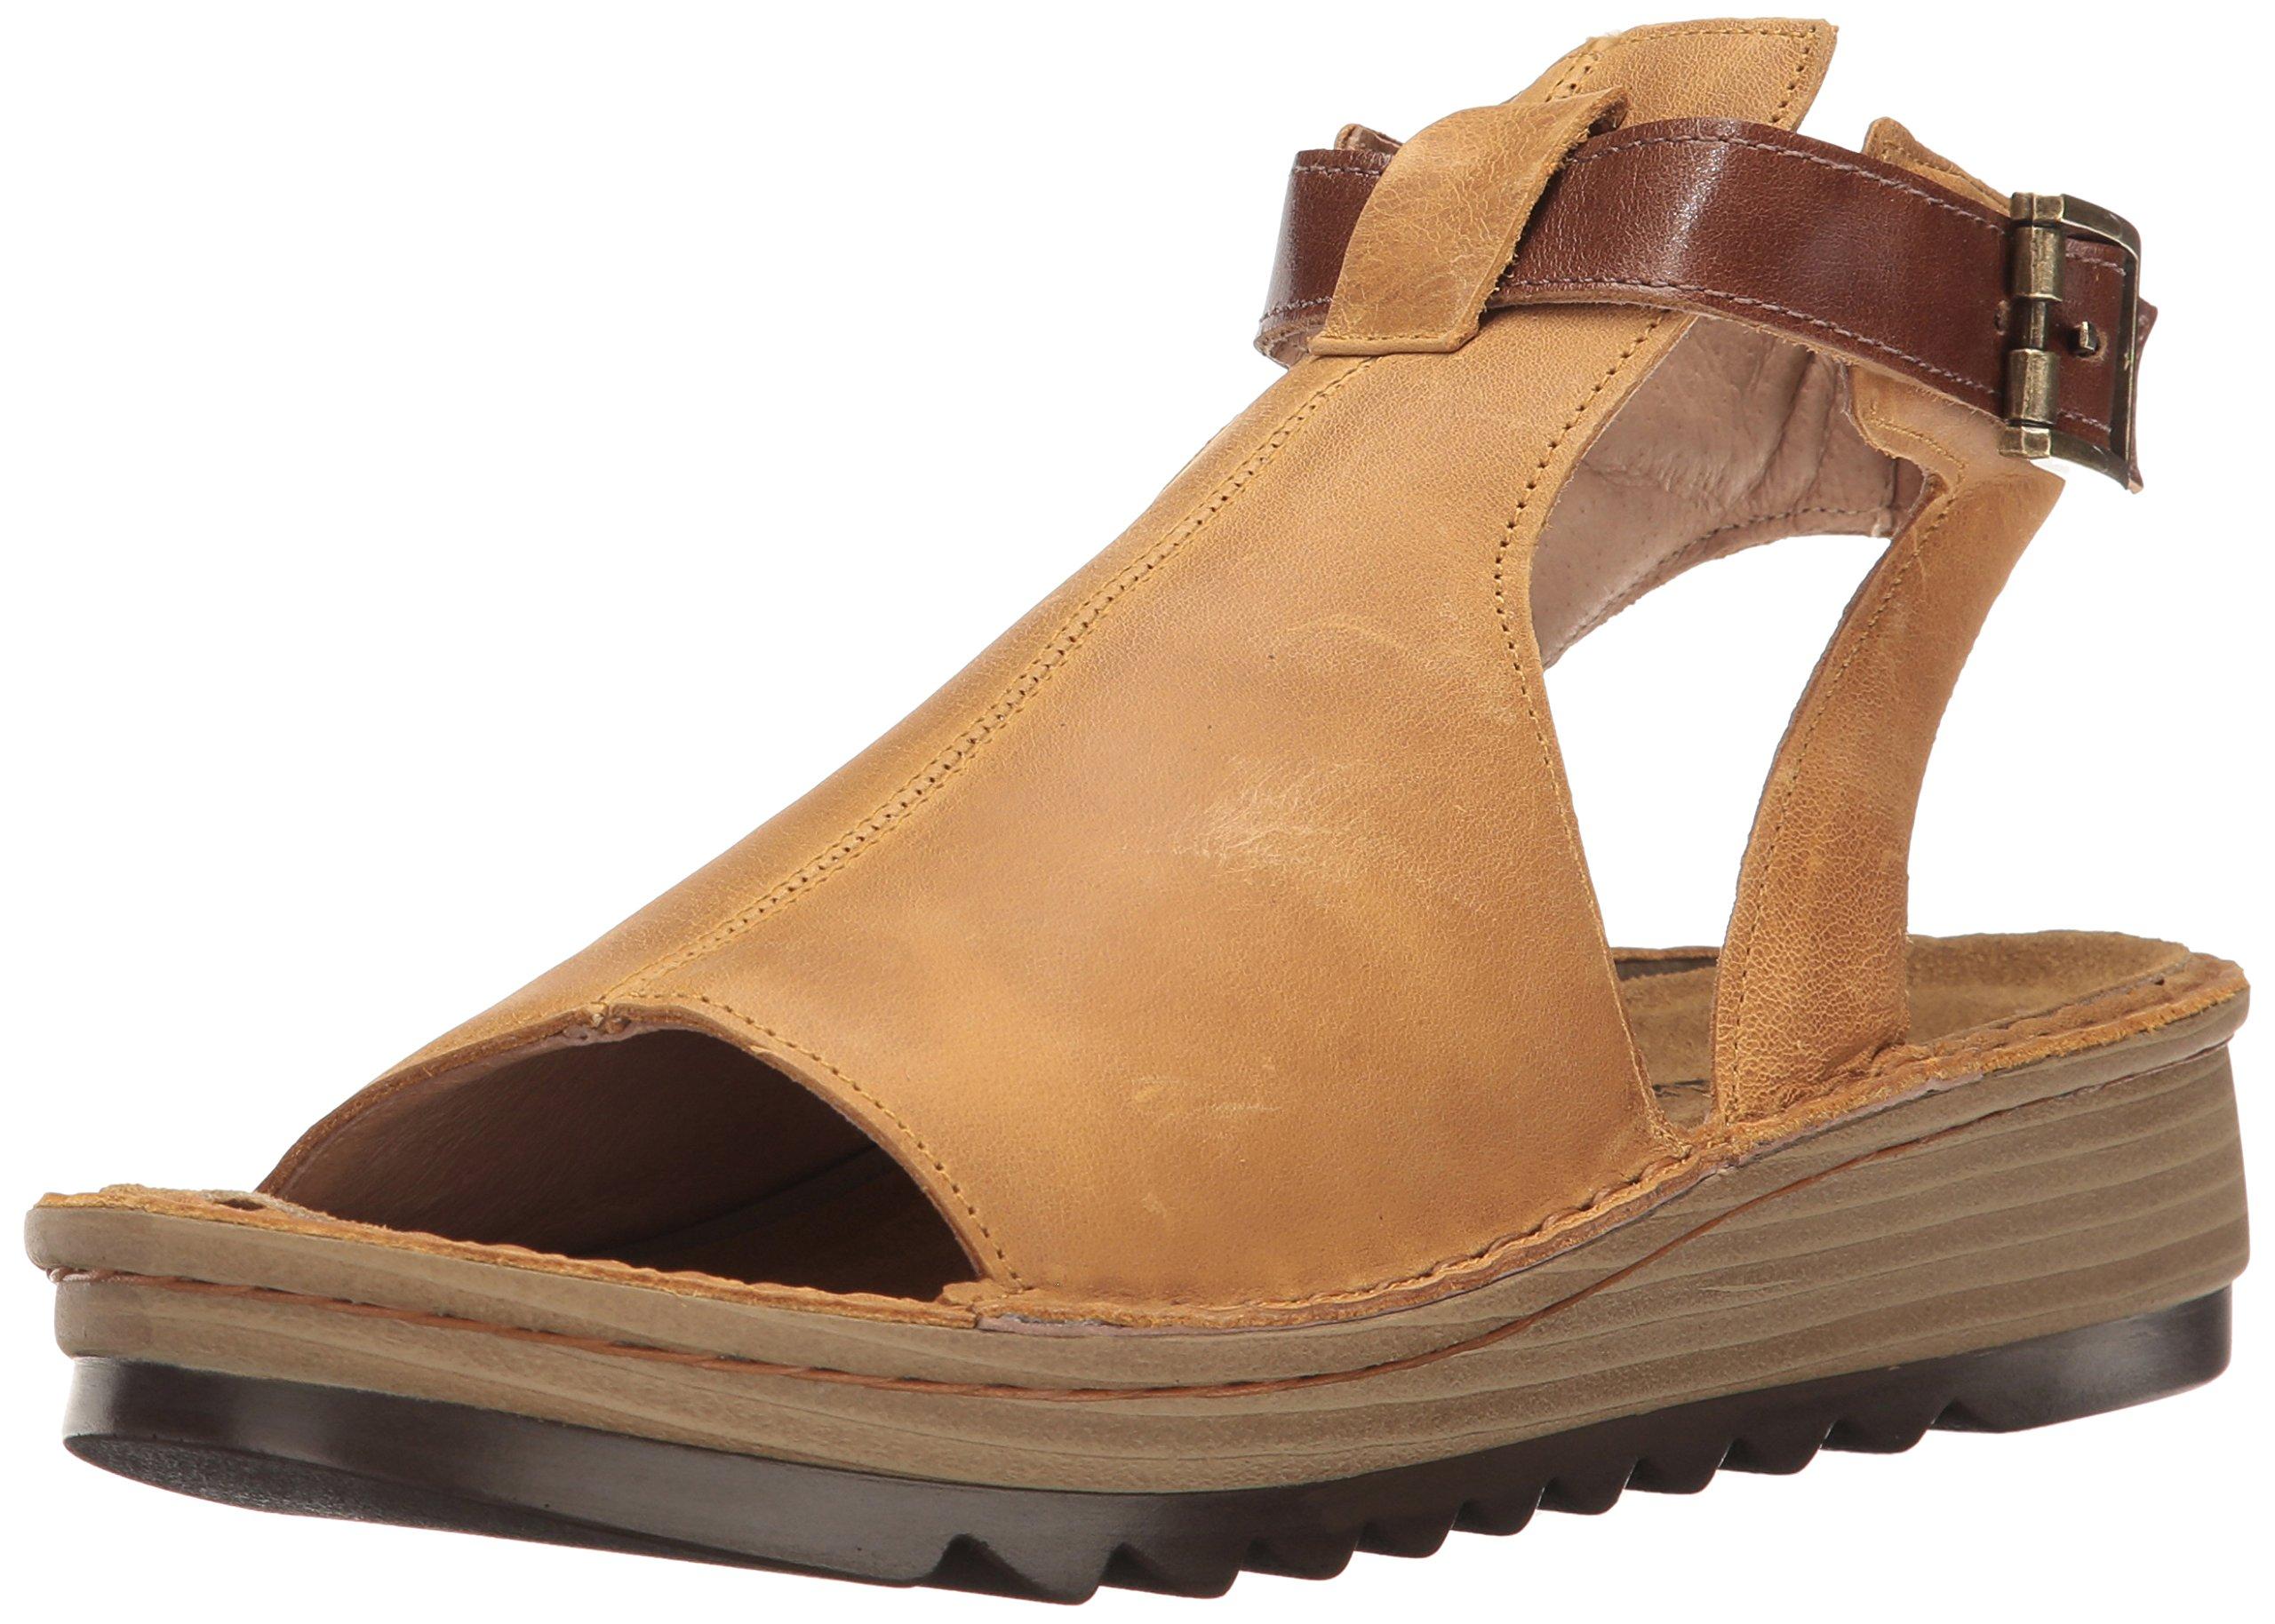 Naot Footwear Women's Verbena, Oily Dune Nubuck/Maple Brown Leather, 38 (US Women's 7) M